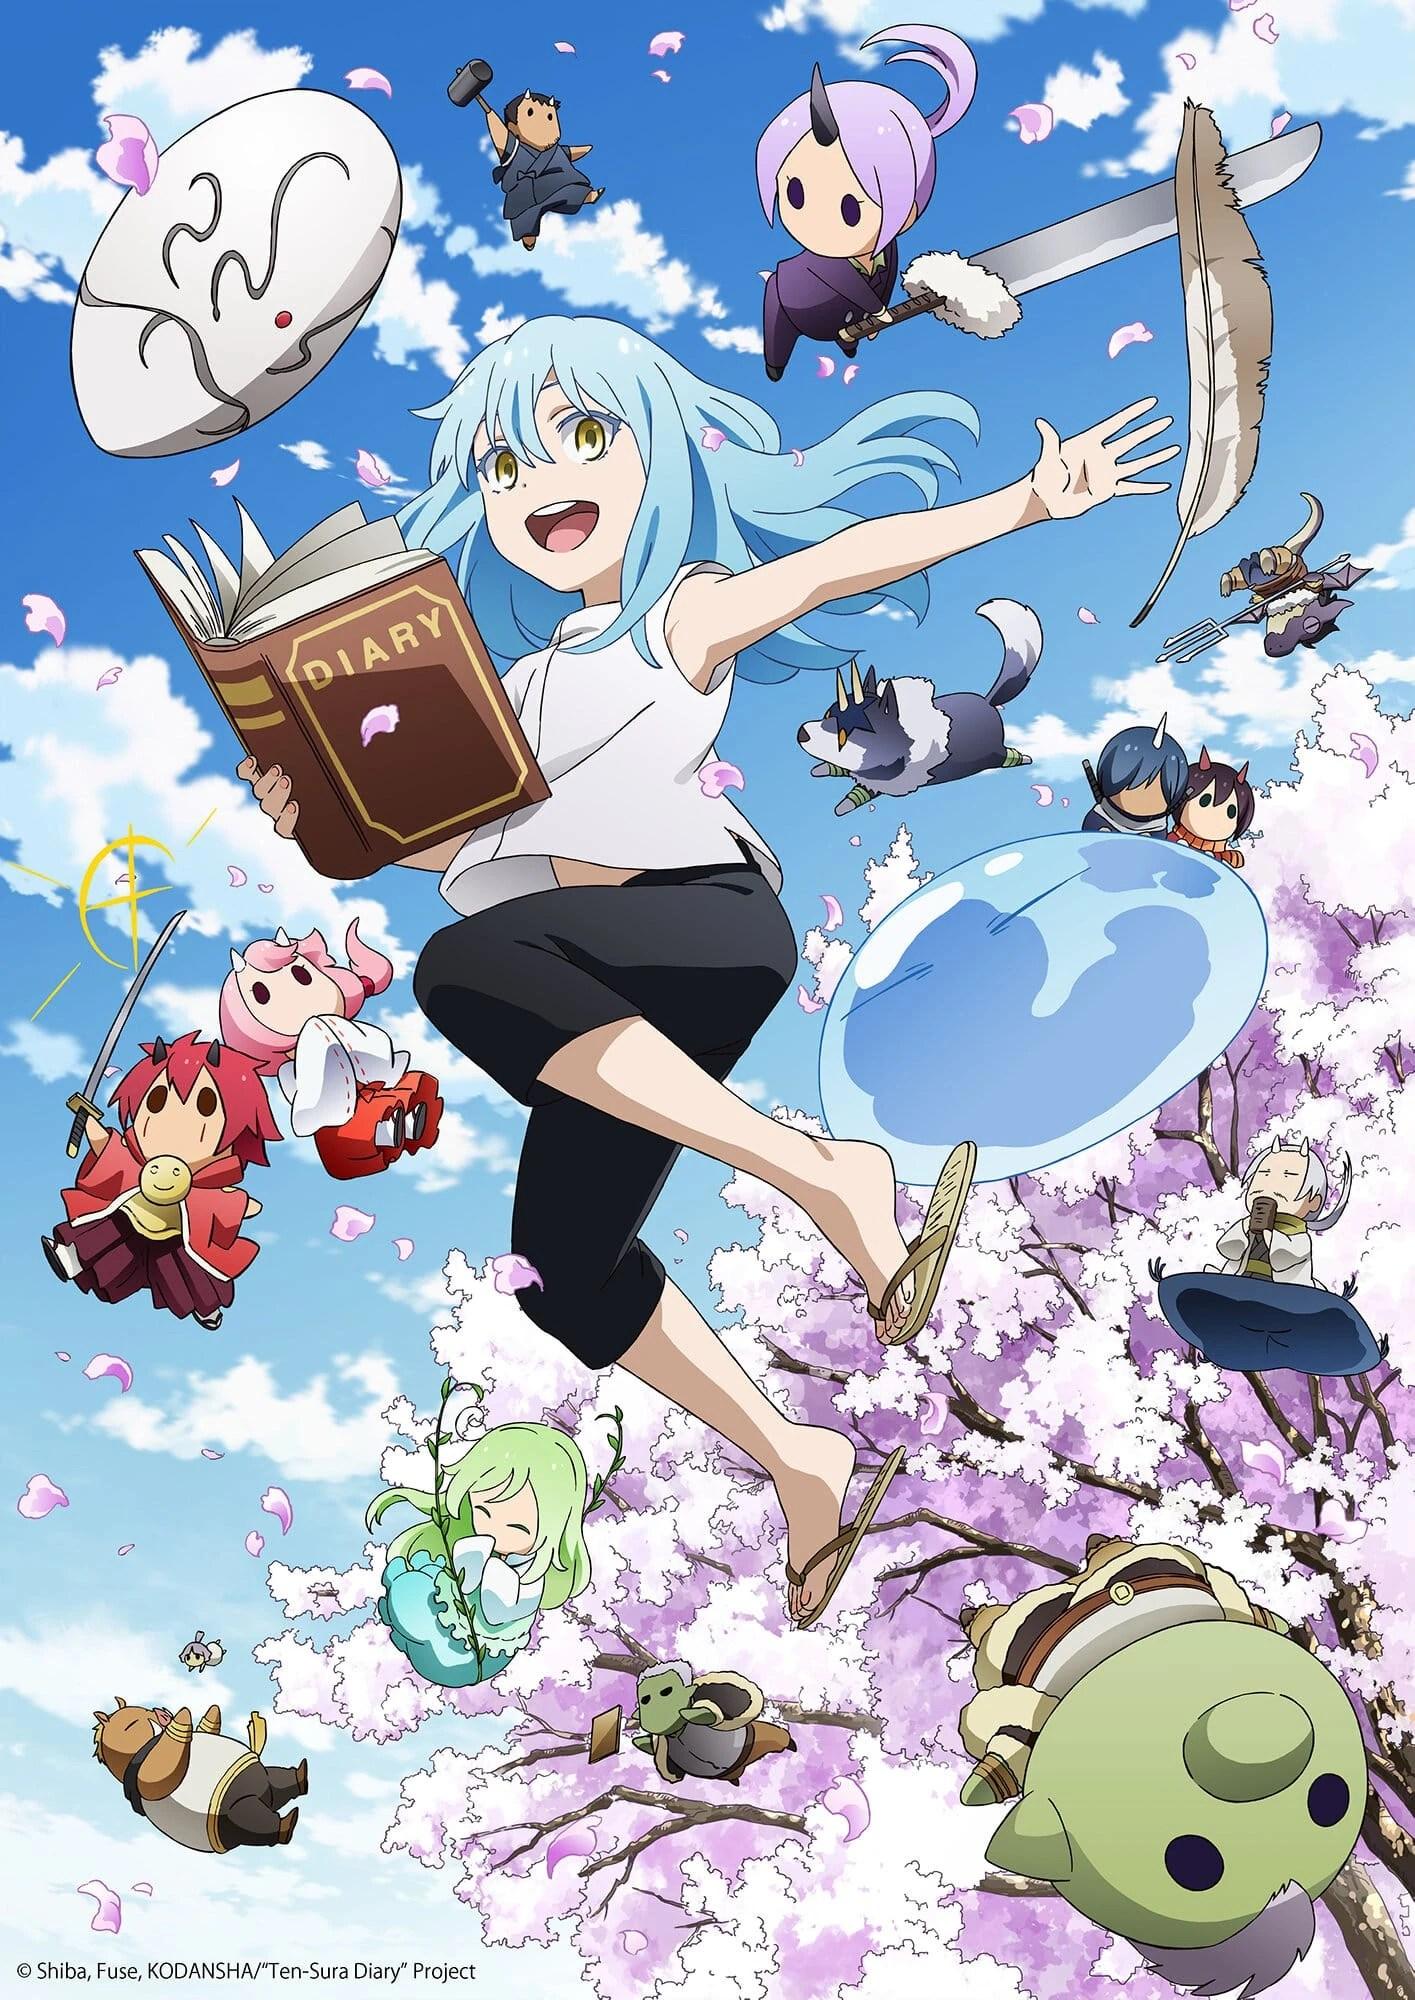 Tensei Shitara Slime Datta Ken - Episode 1 Vostfr : tensei, shitara, slime, datta, episode, vostfr, Anime, Tensei, Shitara, Slime, Datta, Fandom